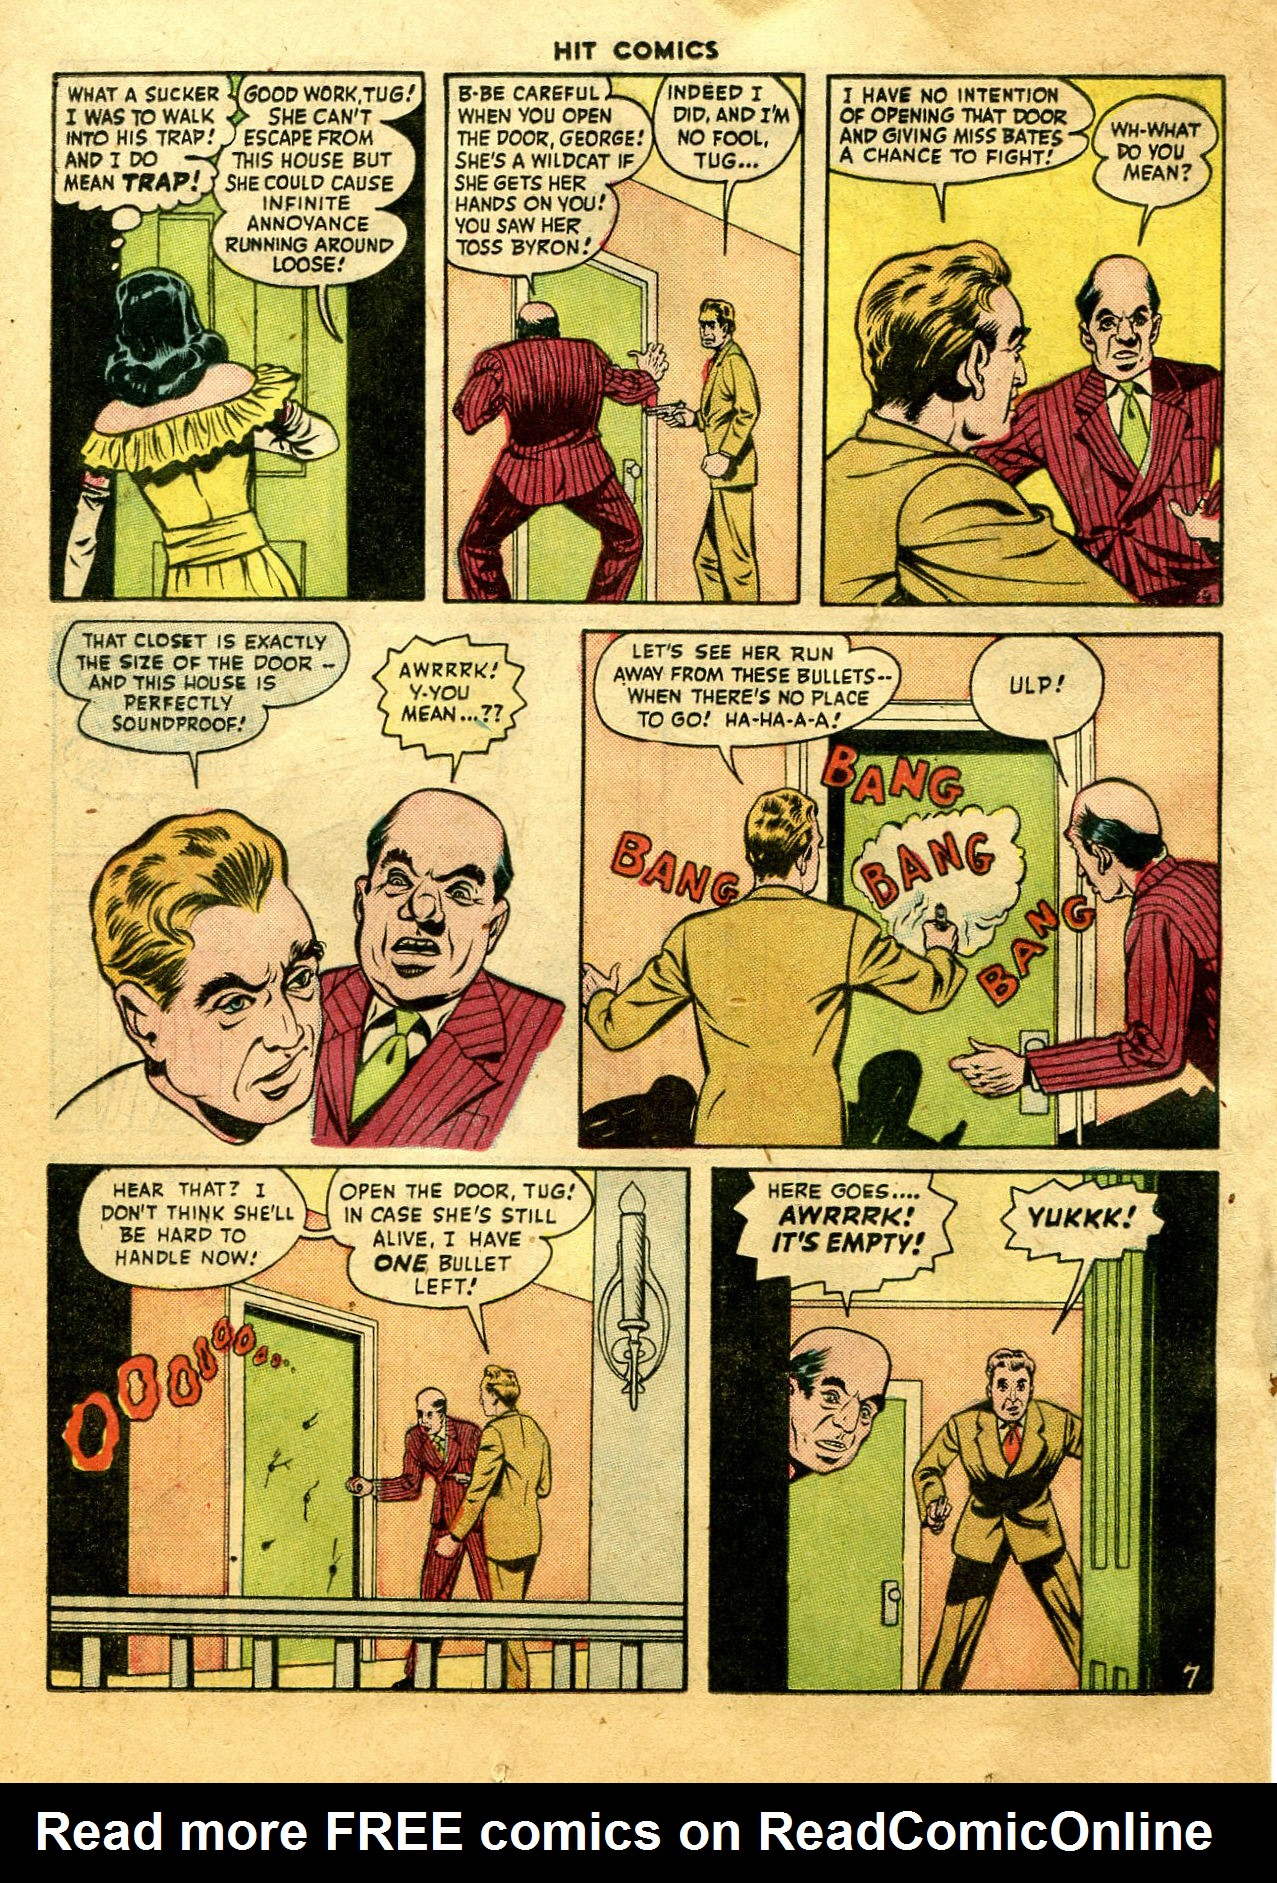 Read online Hit Comics comic -  Issue #44 - 36